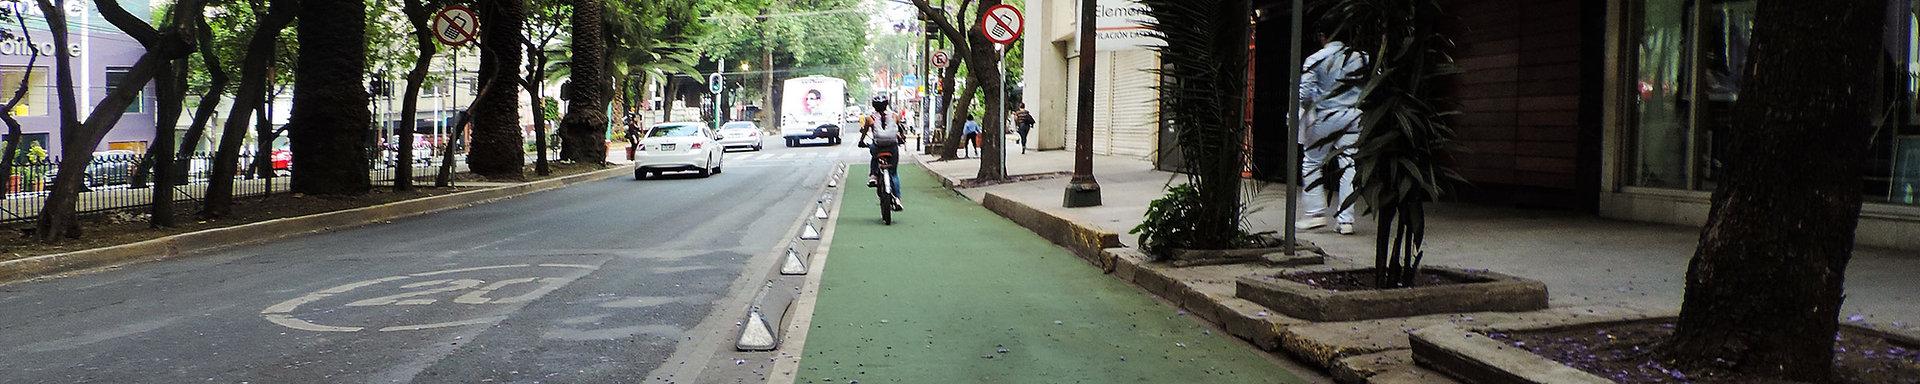 confinamientos-ciclistas-neko-bikelane-c